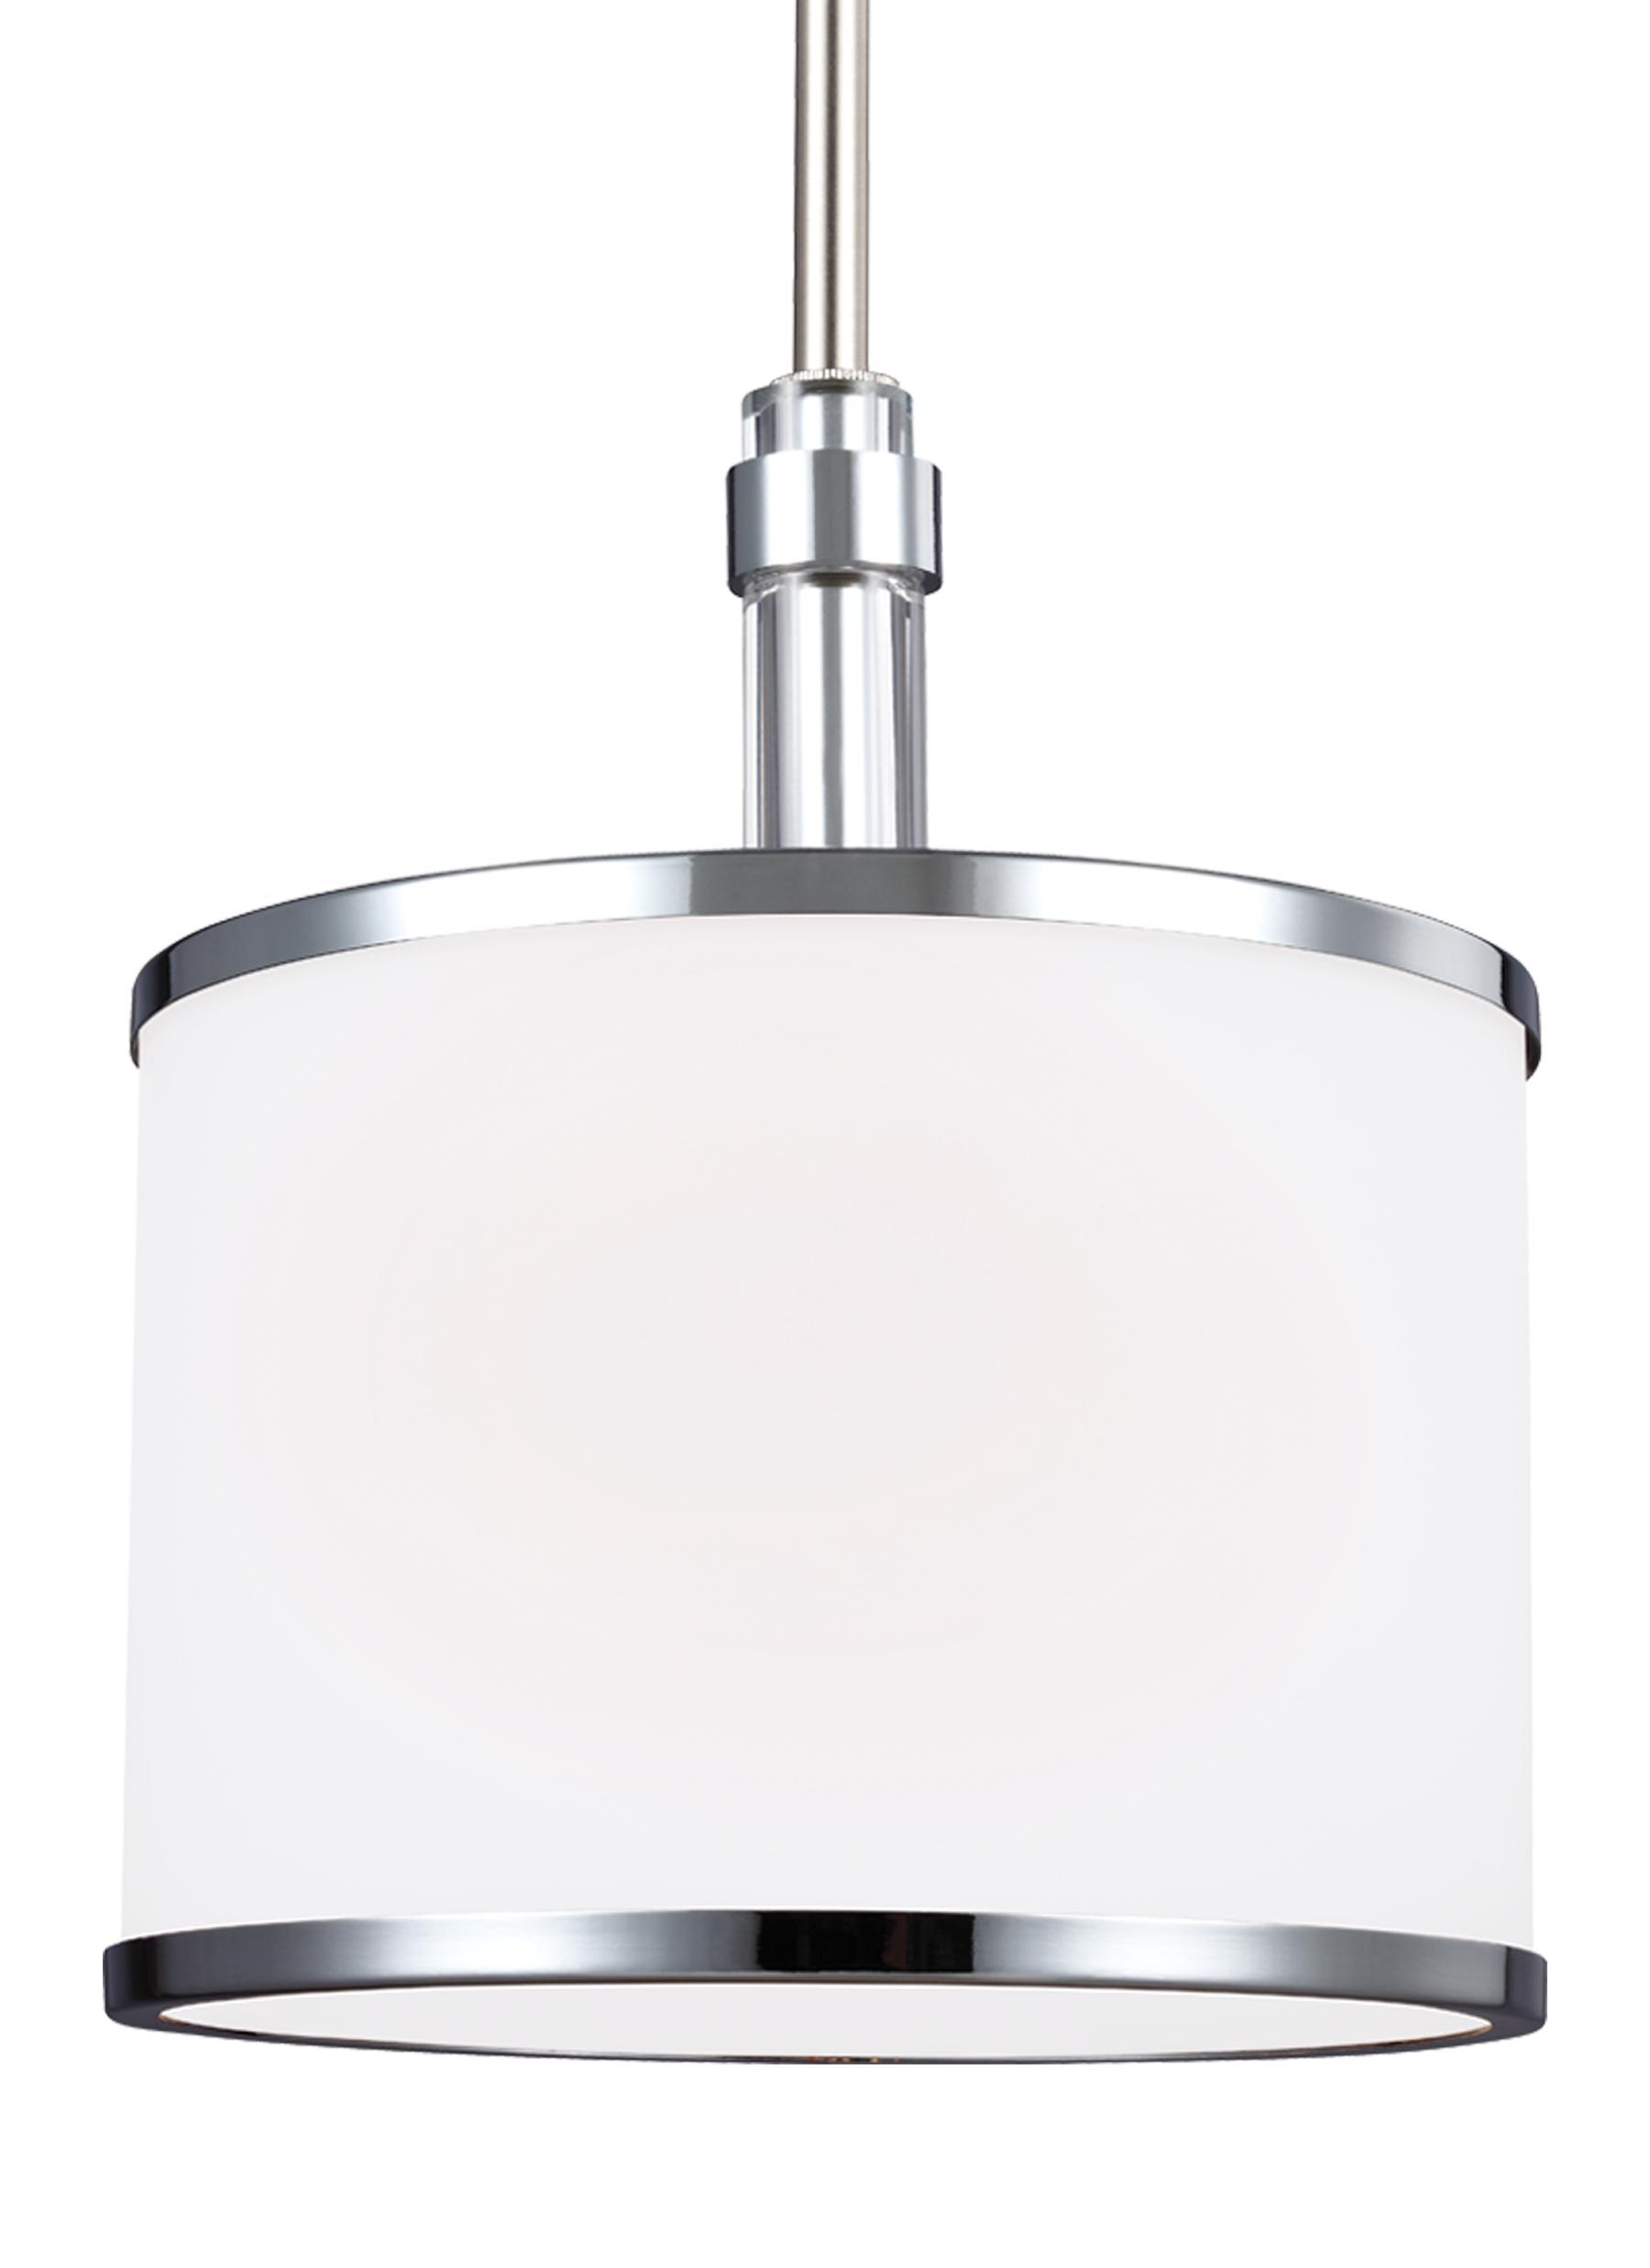 P1417snch1 light mini pendantsatin nickel chrome loading zoom aloadofball Gallery